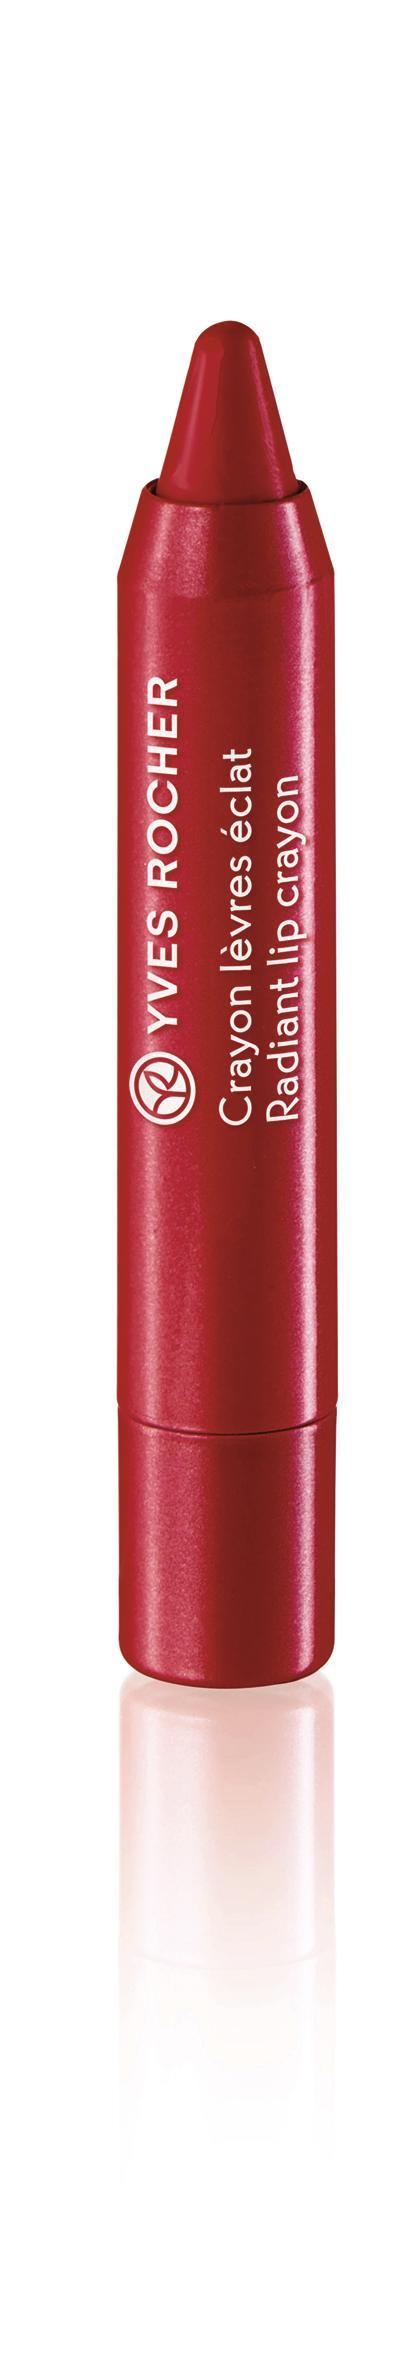 Couleurs Nature Radiant Lip Crayon Rouge flamboyantx